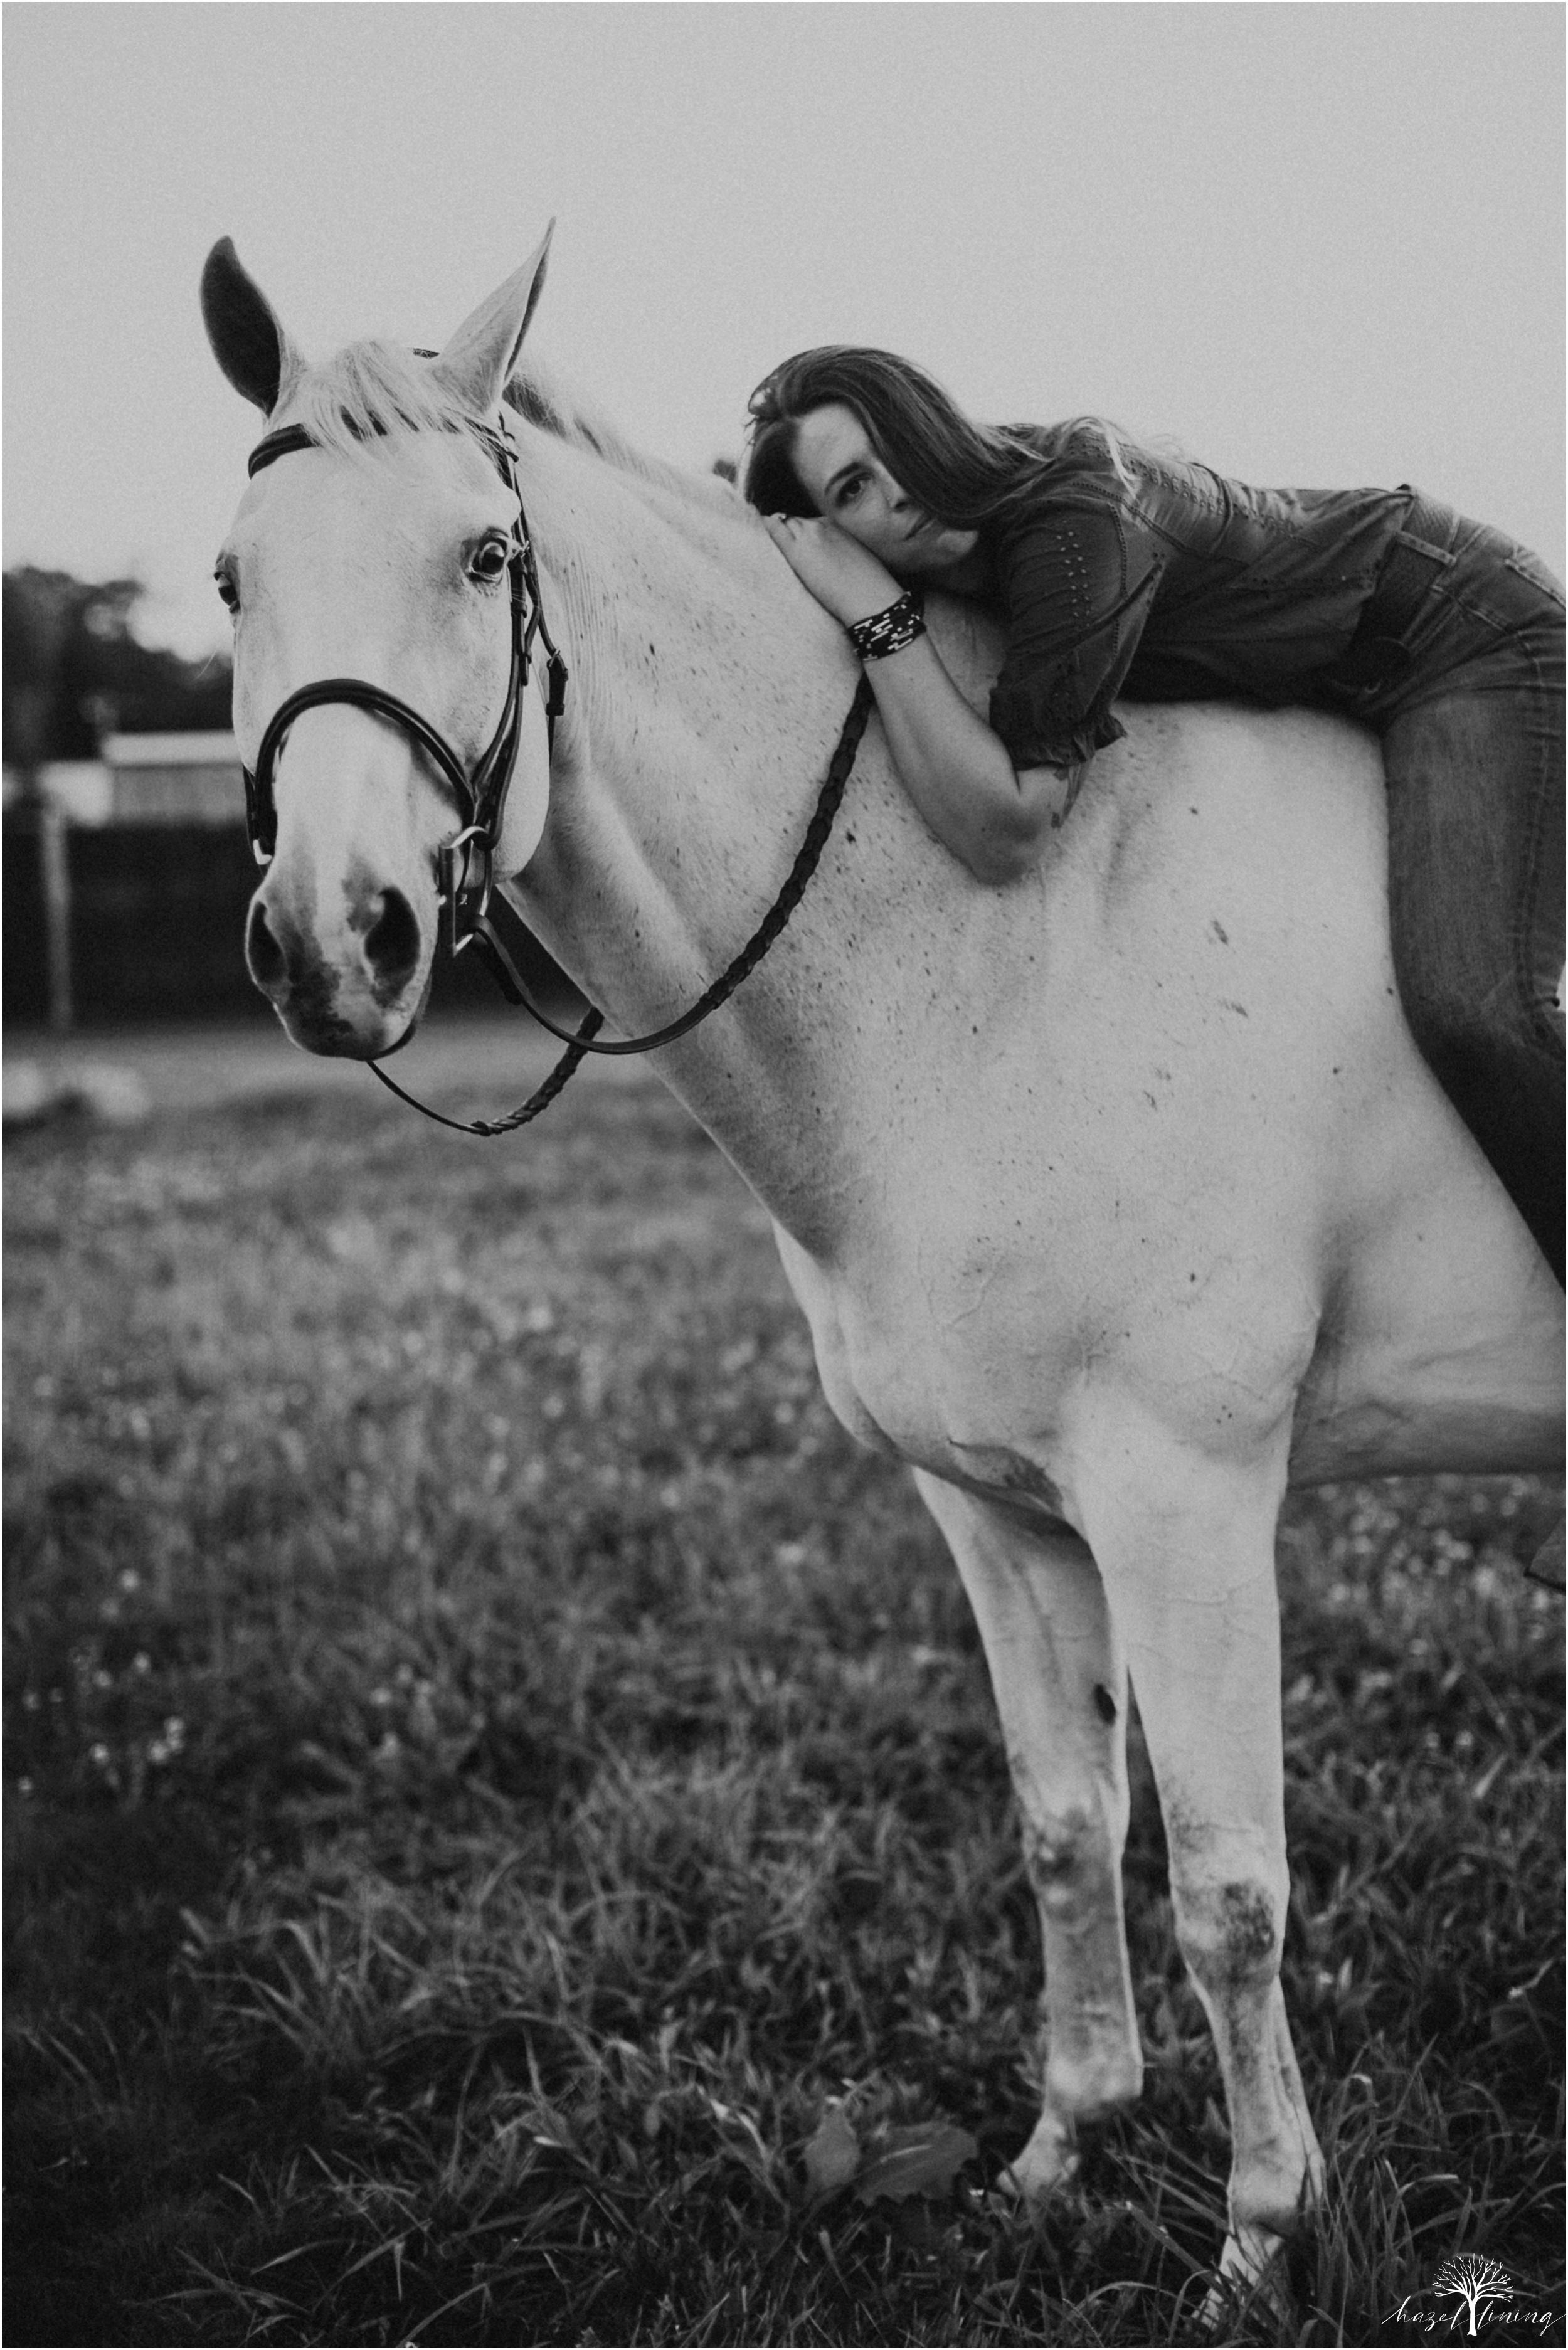 taylor-adams-and-horse-delaware-valley-university-delval-summer-equestrian-portrait-session-hazel-lining-photography-destination-elopement-wedding-engagement-photography_0039.jpg